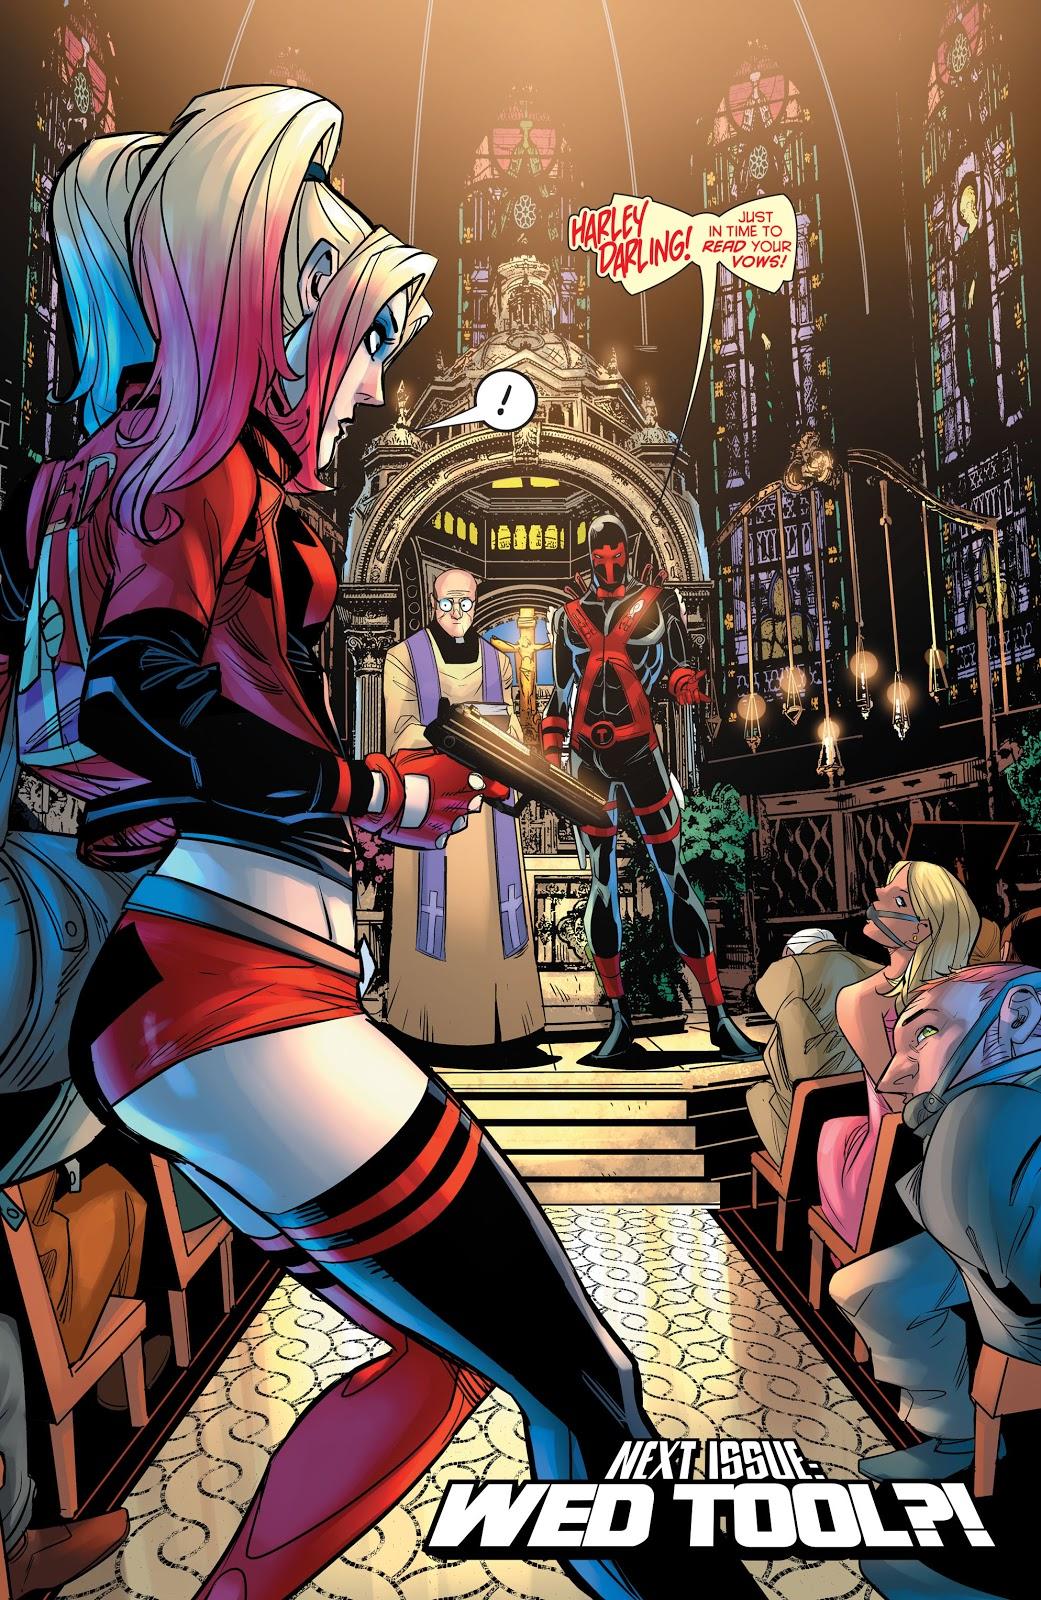 Harley Quinn Vol. 2 #27